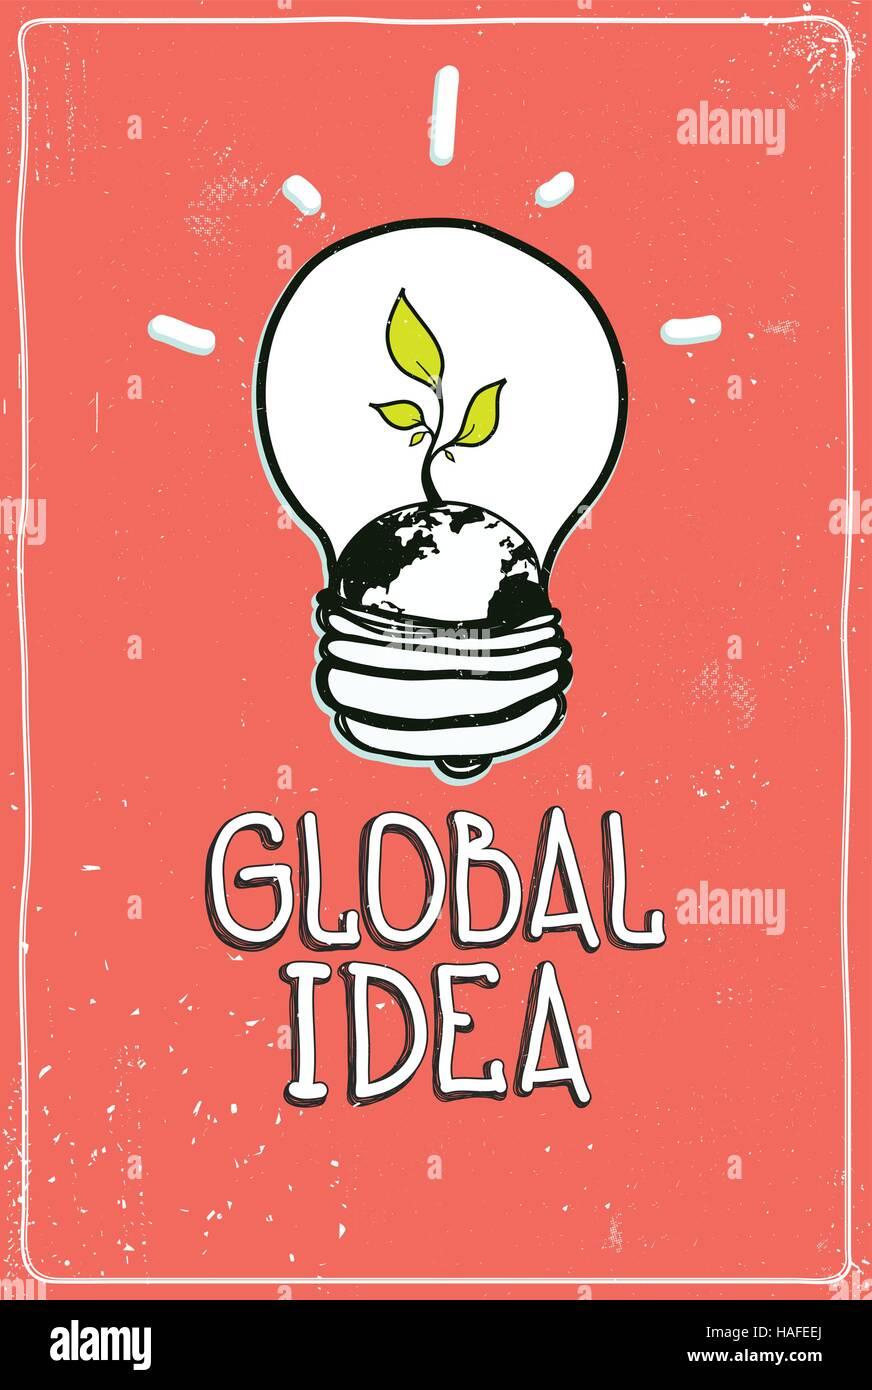 Global idea - Stock Vector